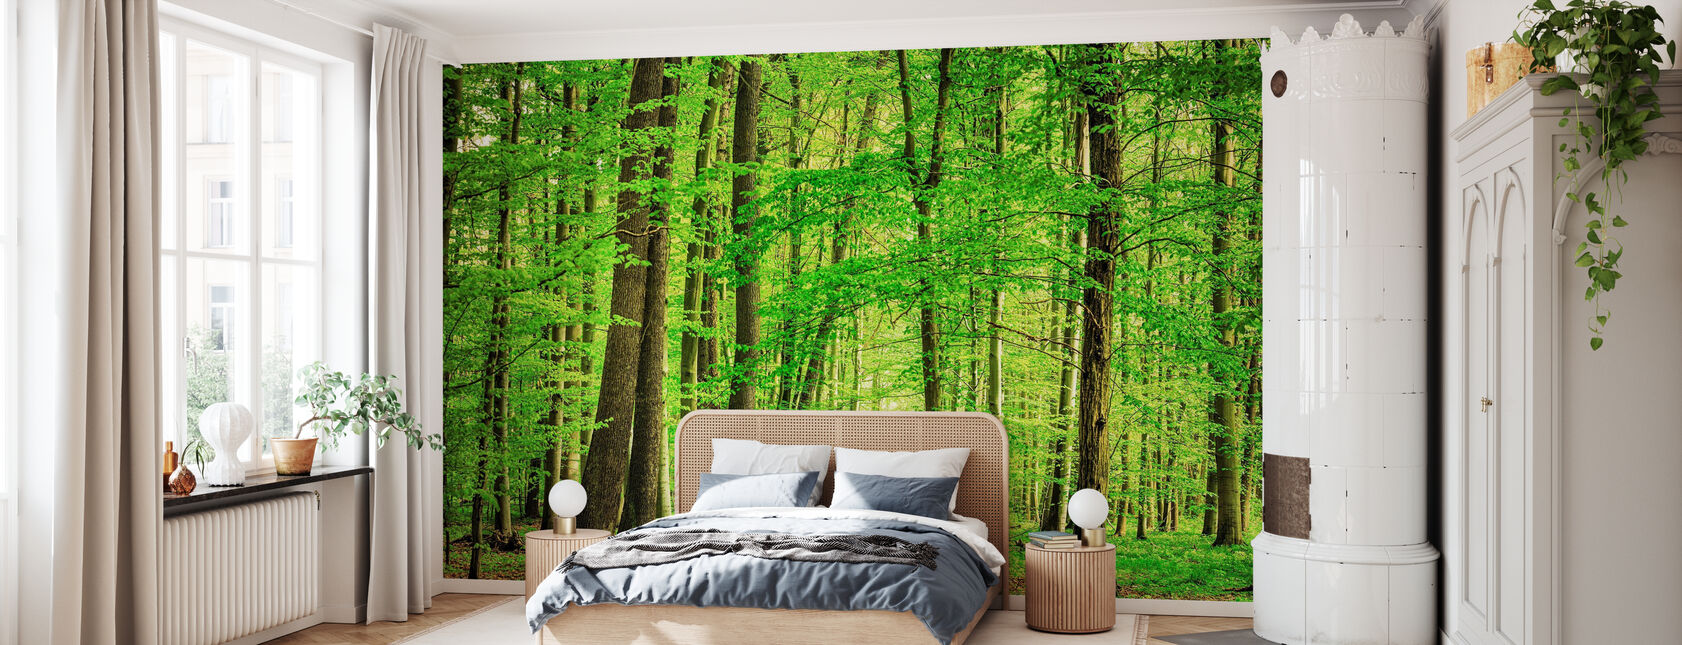 Grønne Skov i foråret - Tapet - Soveværelse